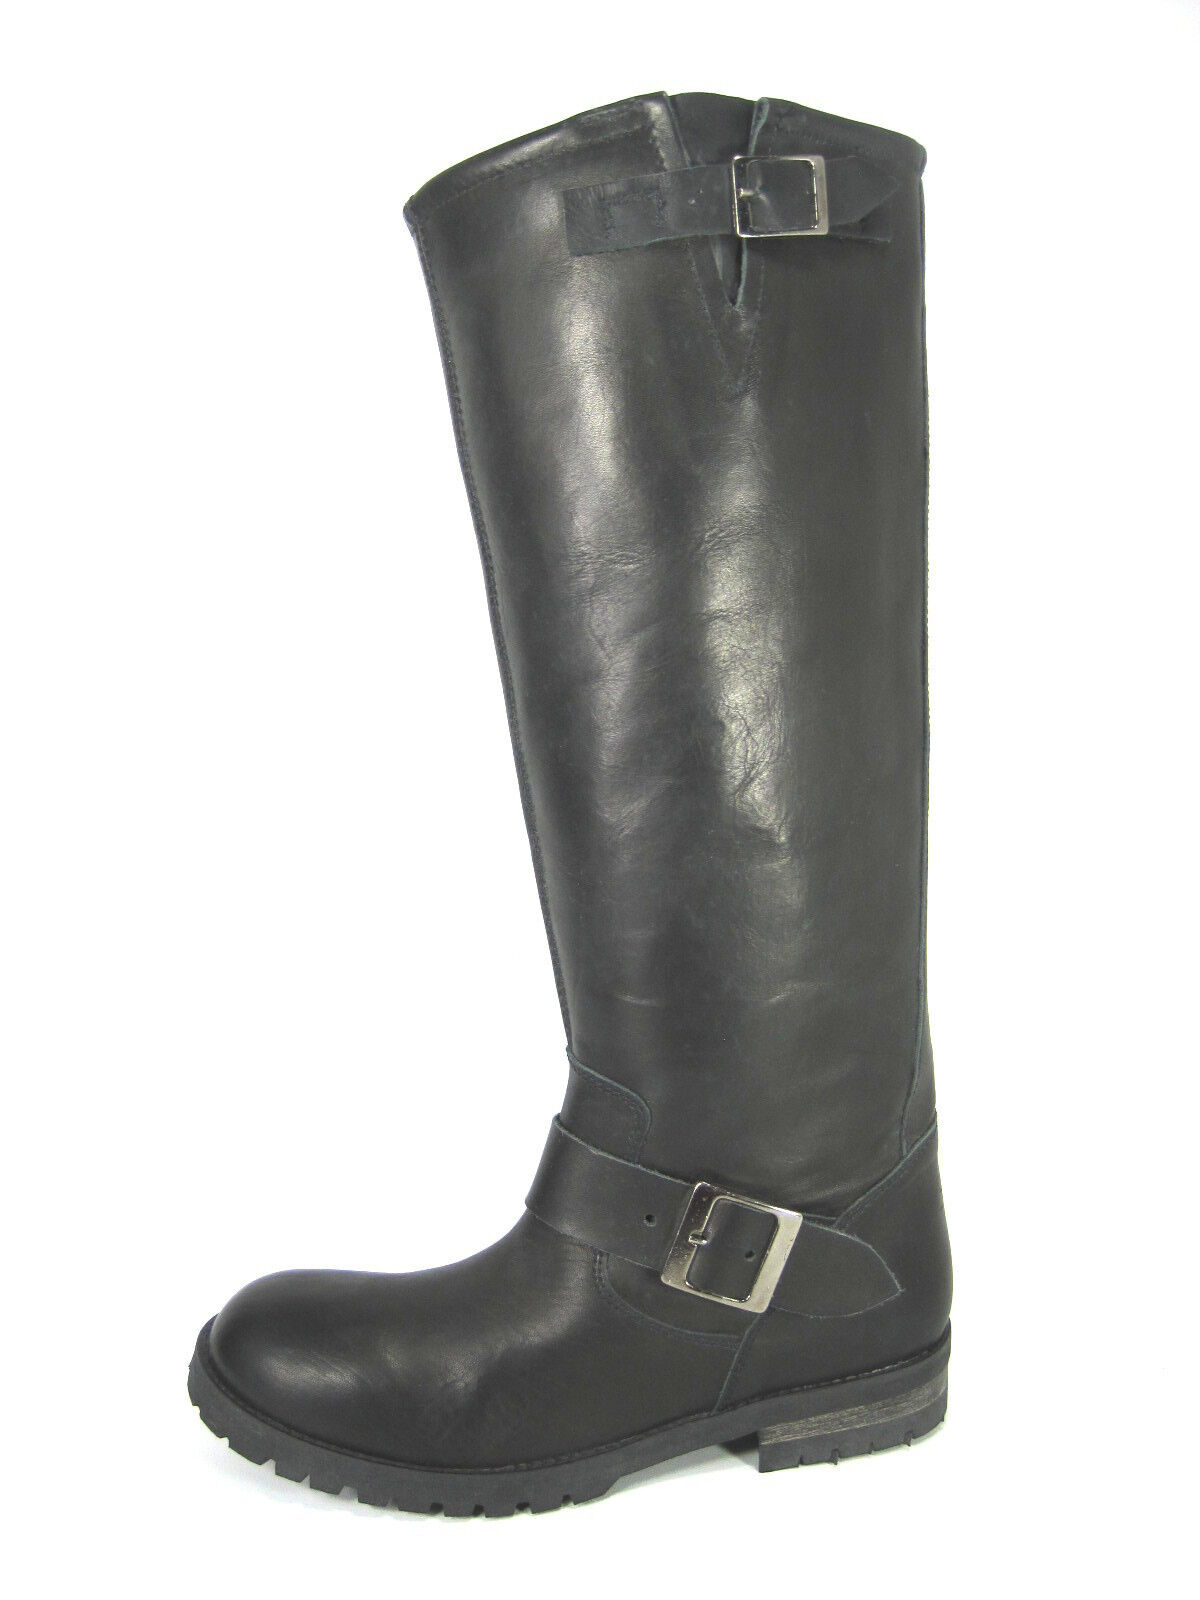 zapatos Diem bota Wmn's 13991 knee-high bota Diem de moto wshd Blk Lthr Eur 37 nos Talle 7 M 3c68fd